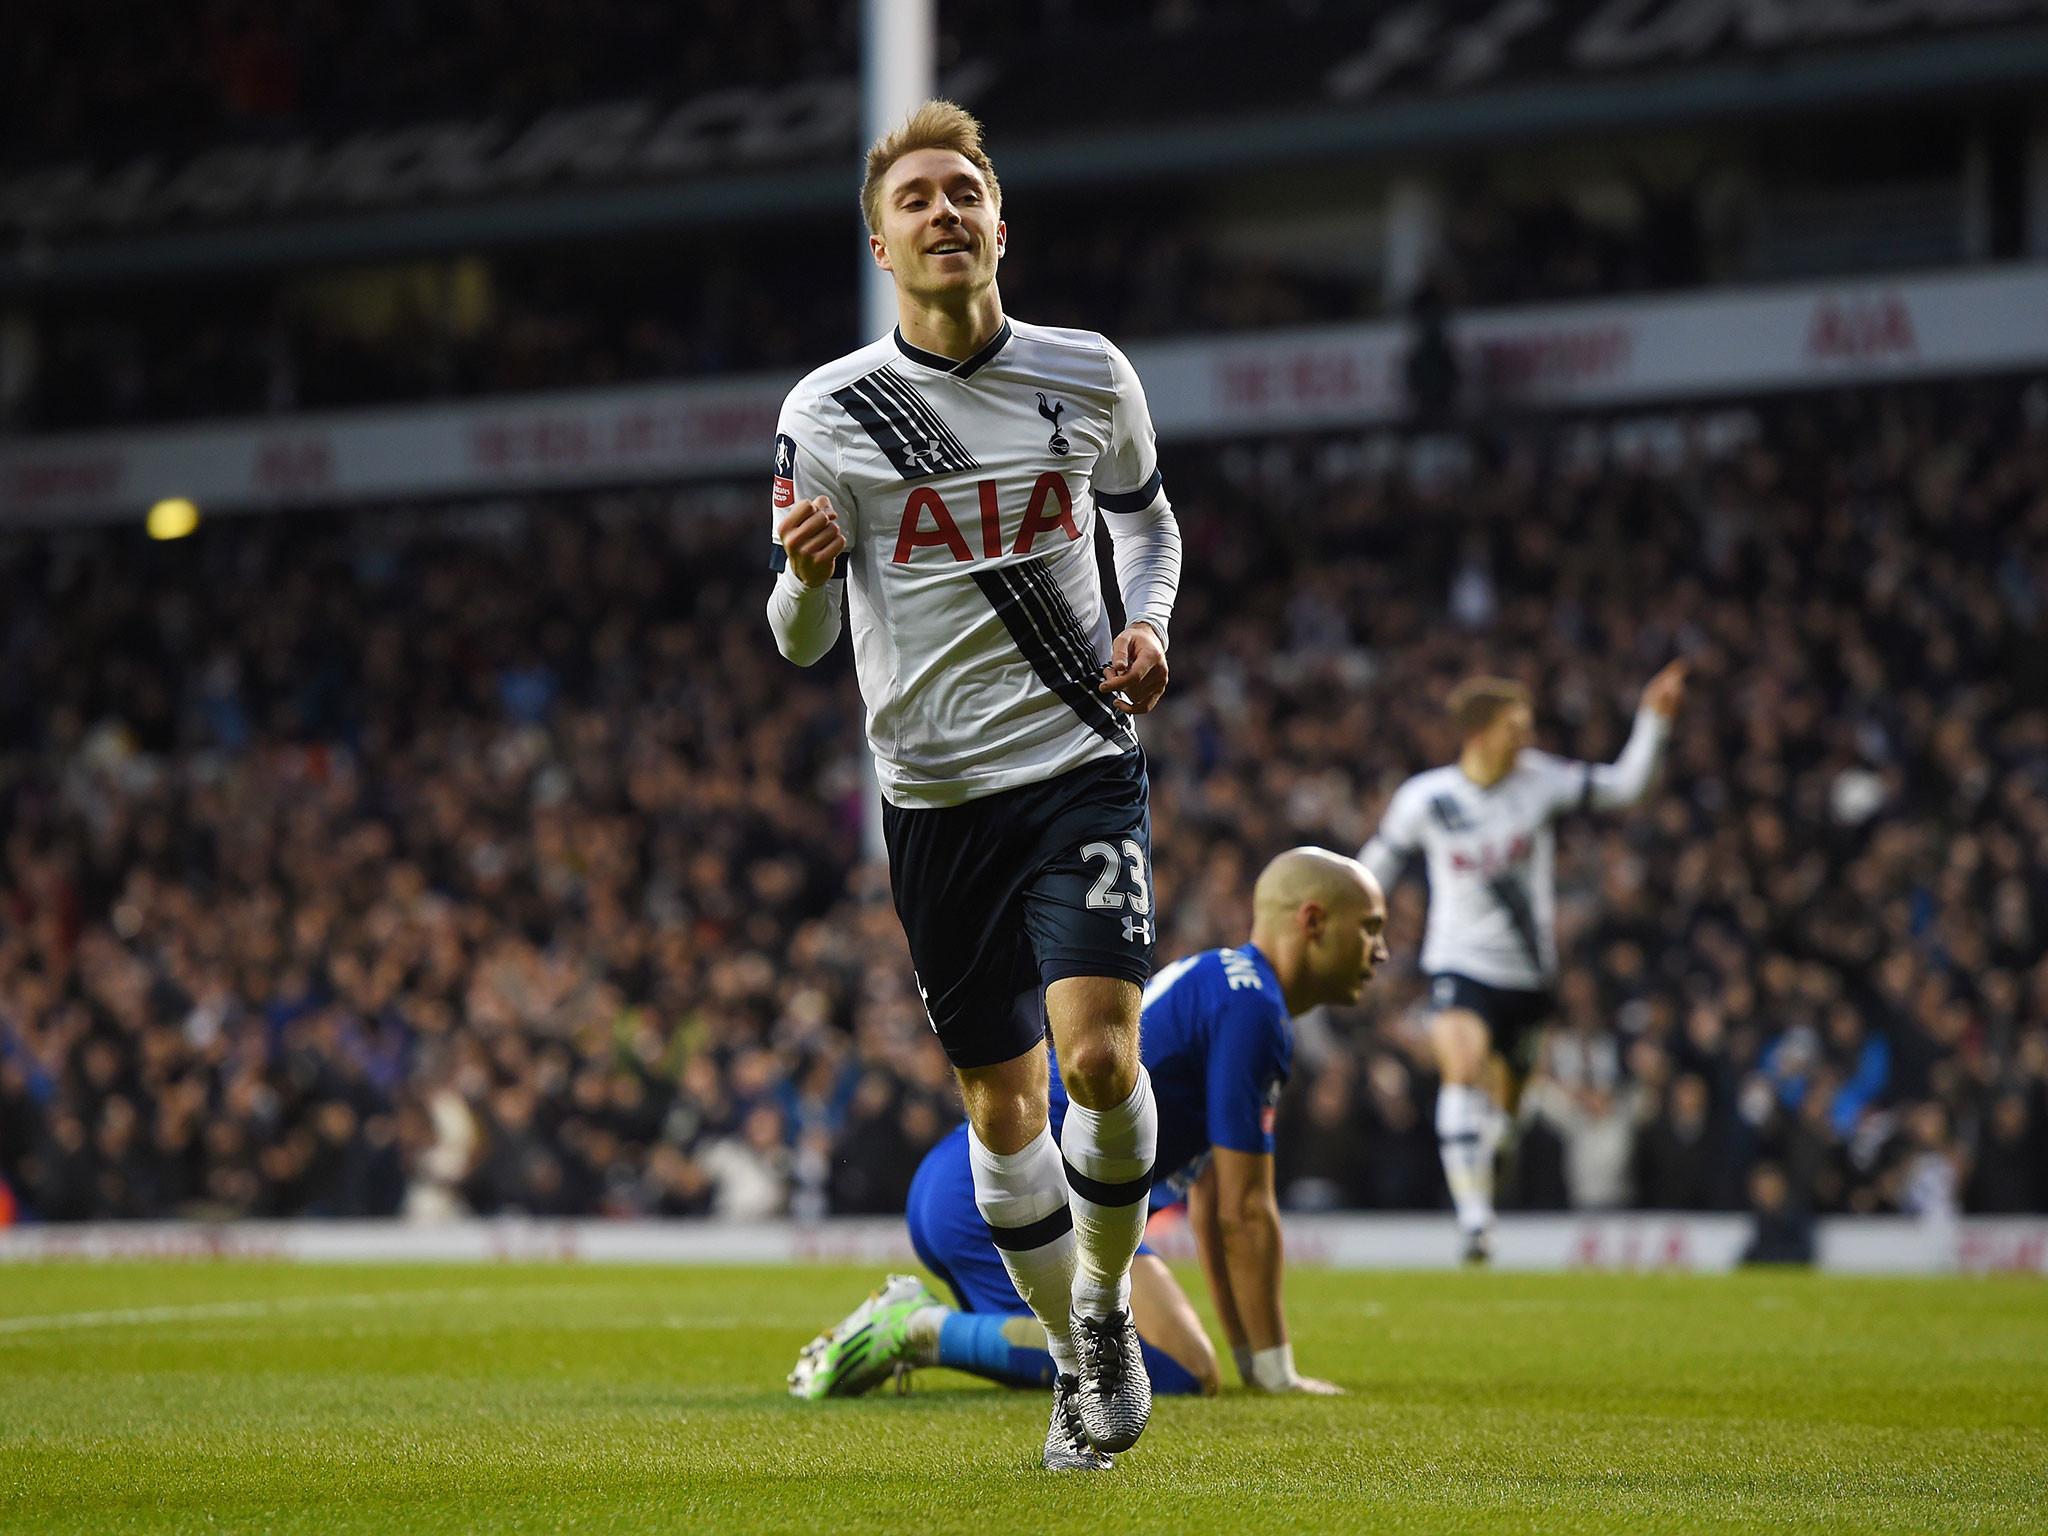 Tottenham Hotspur: 2016/17 In Review